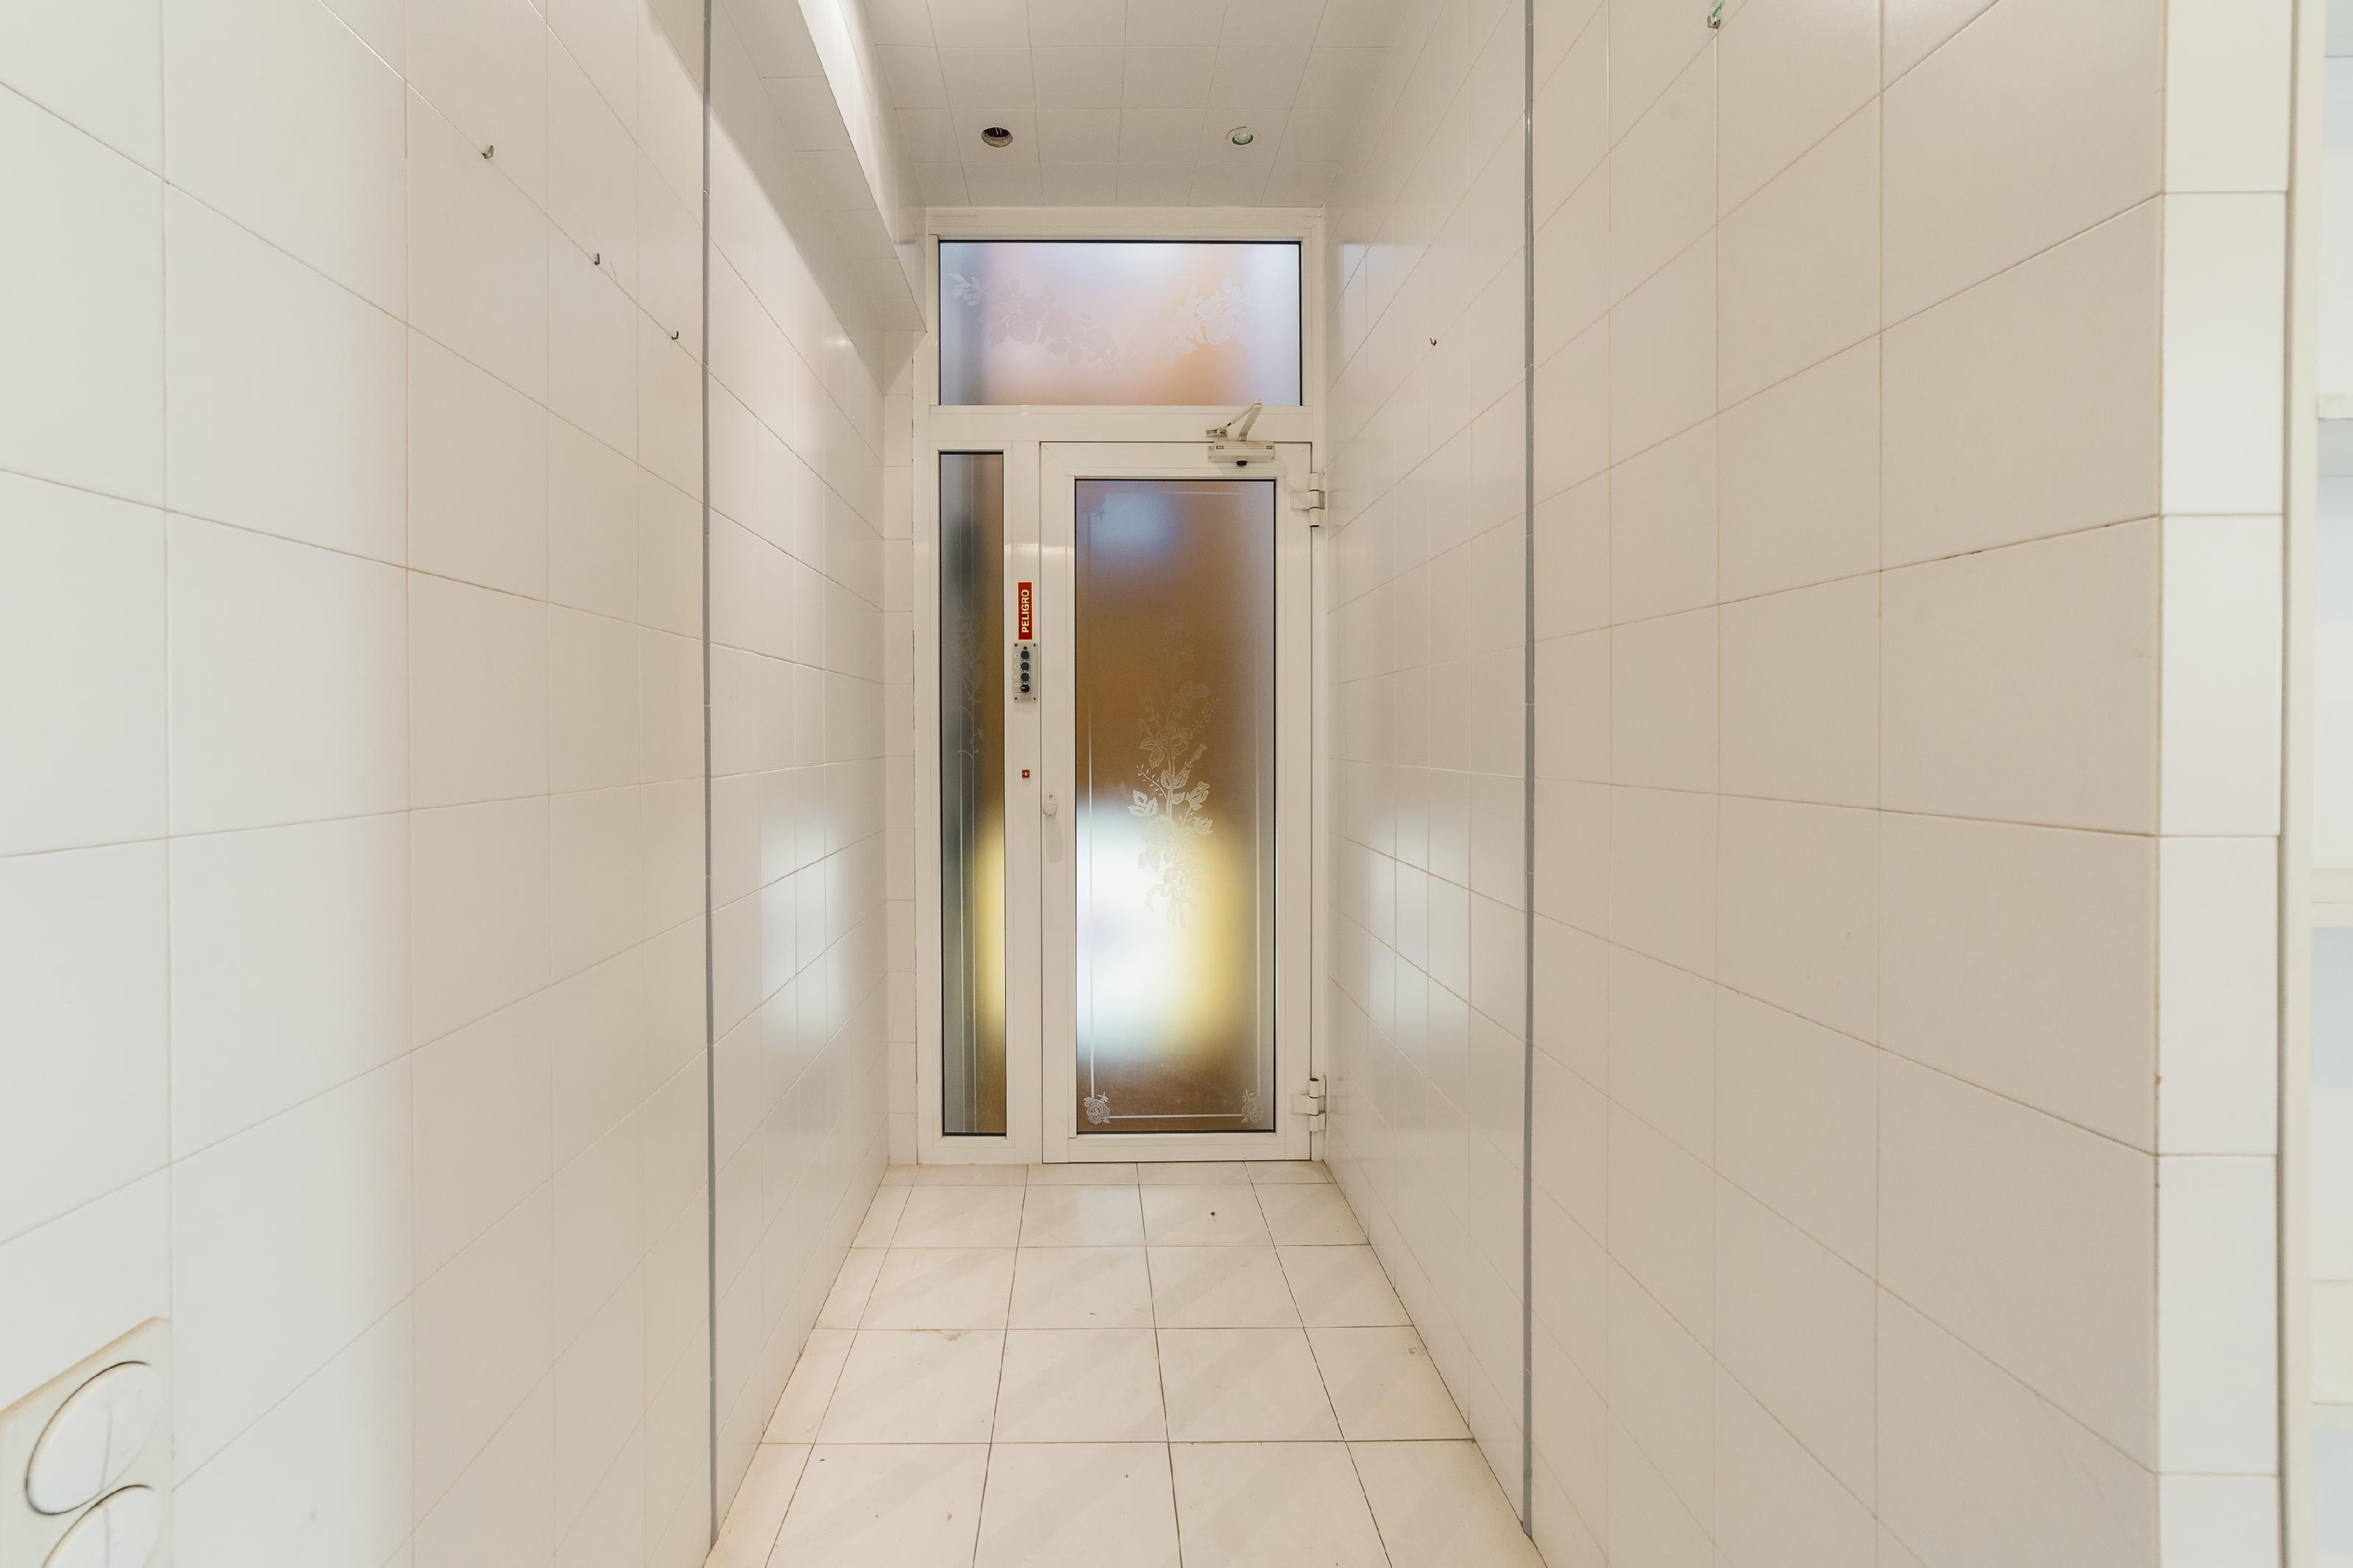 249314 Penthouse for sale in Sarrià-Sant Gervasi, Sant Gervasi-Galvany 27